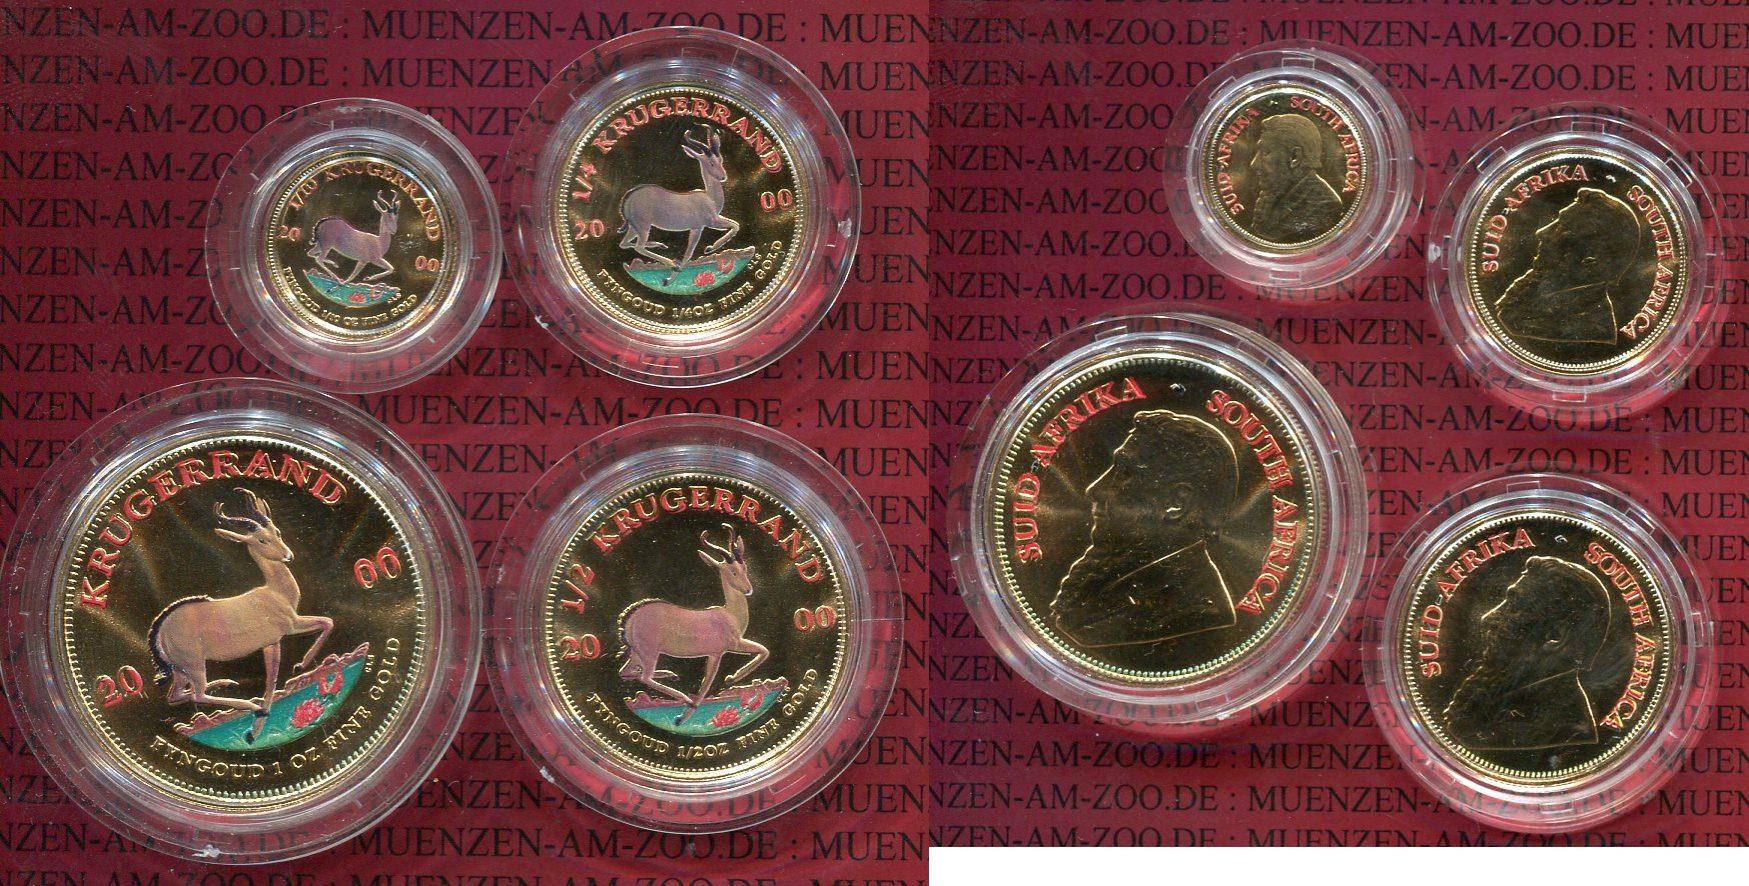 1/10, 1/4, 1/2 1 Unze Krügerrand Gold Süd Afrika 2000 Krügerand Set, 4 x Gold 1/10, 1/4, 1/2 1 Unze Farbmünzen